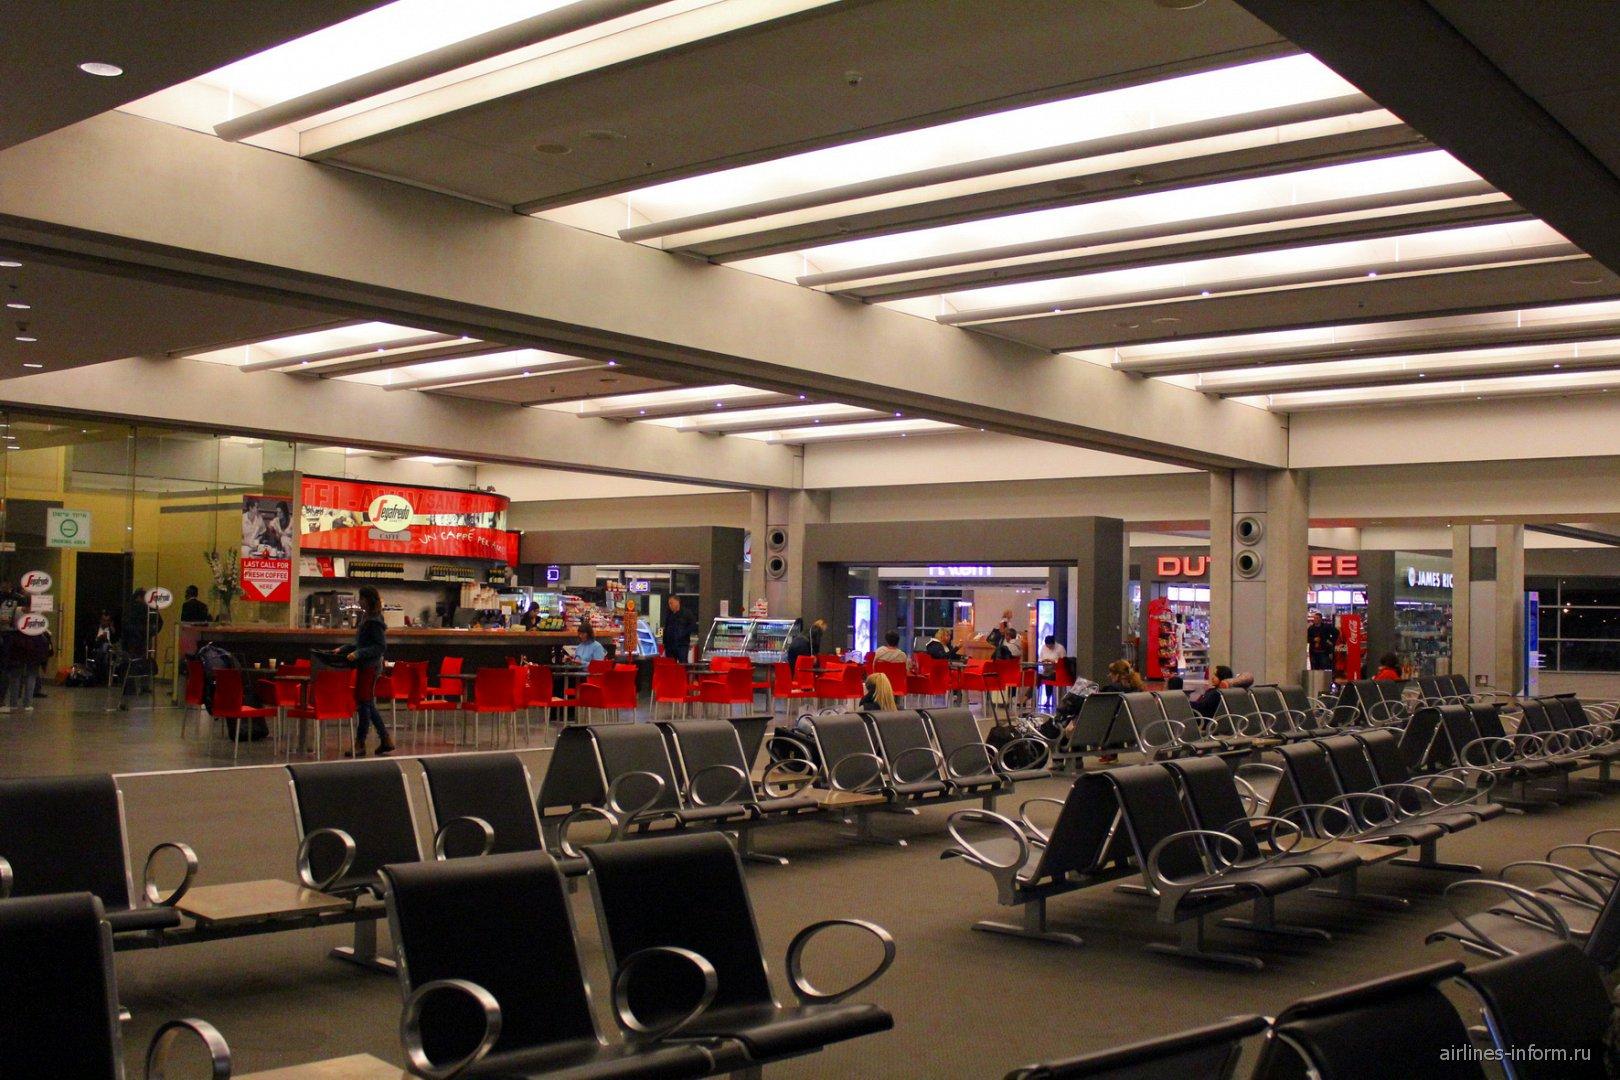 Зал ожидания у выхода на посадку в аэропорту Тель-Авив Бен Гурион